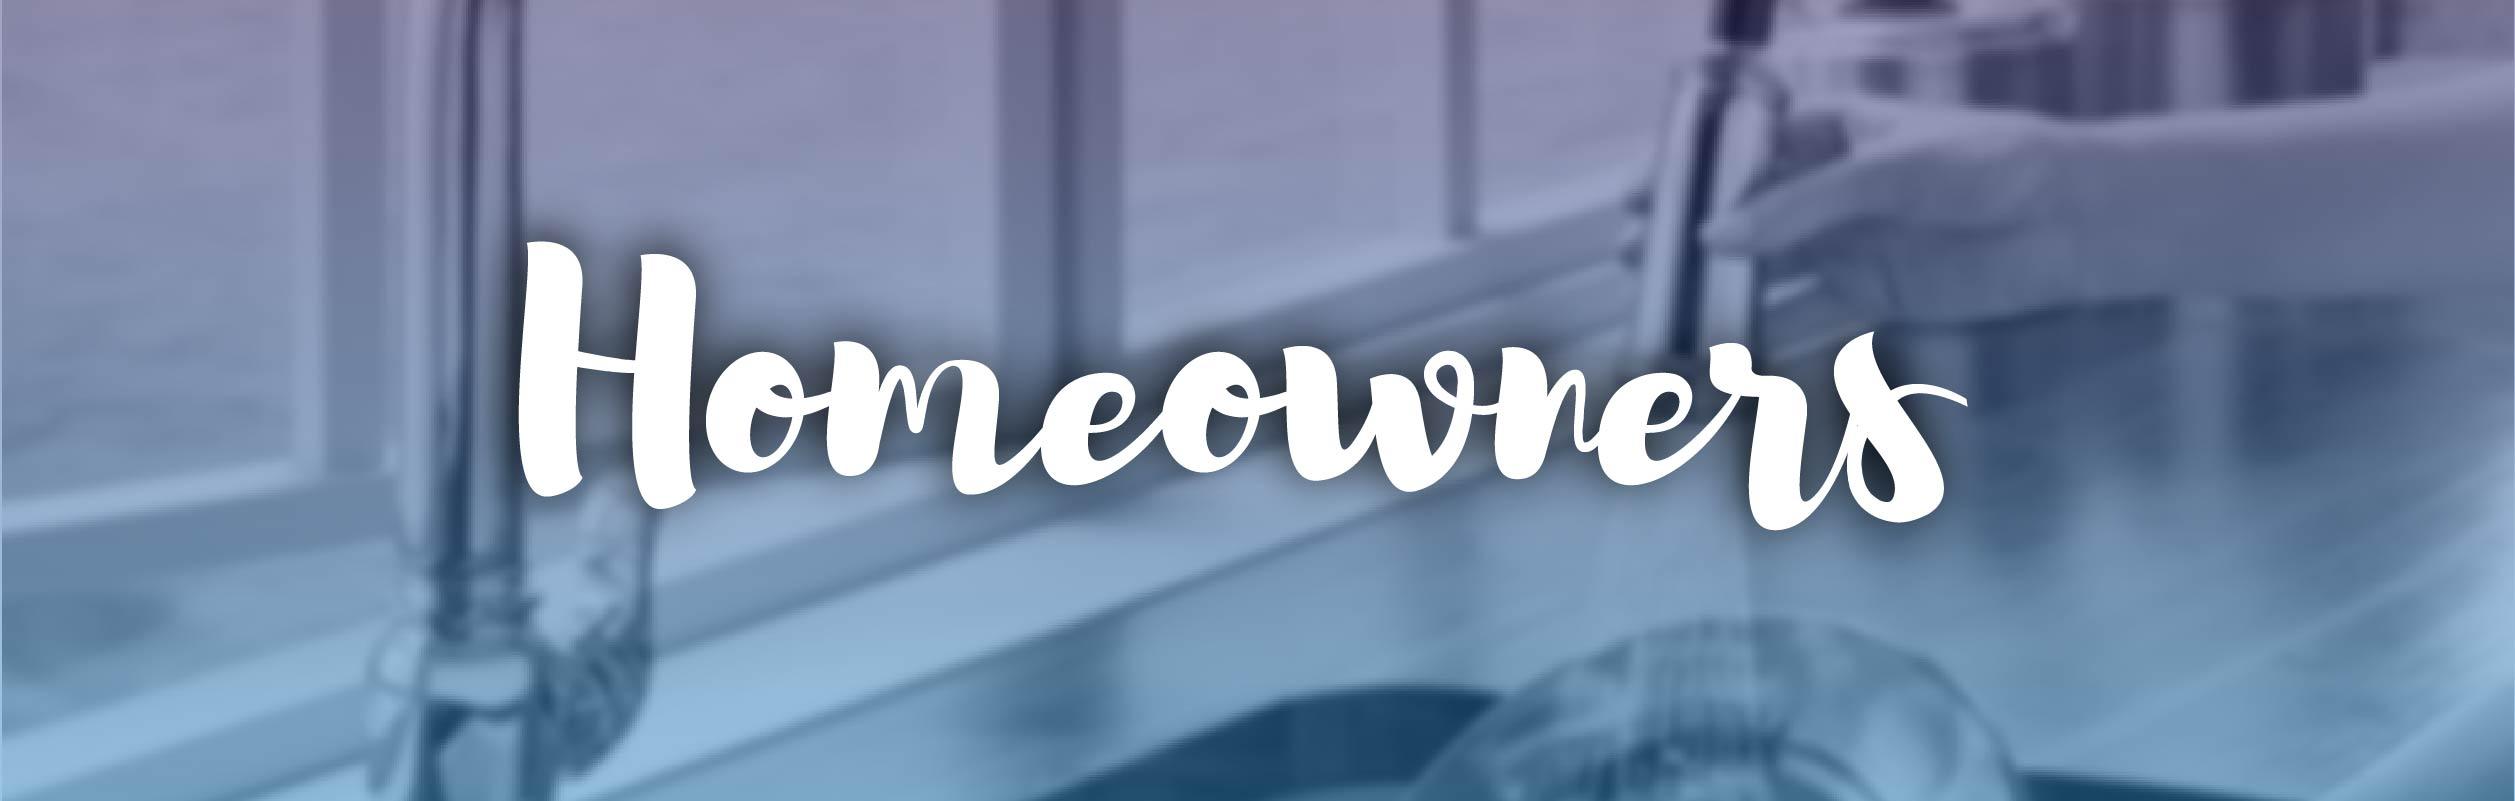 Homeowners-01